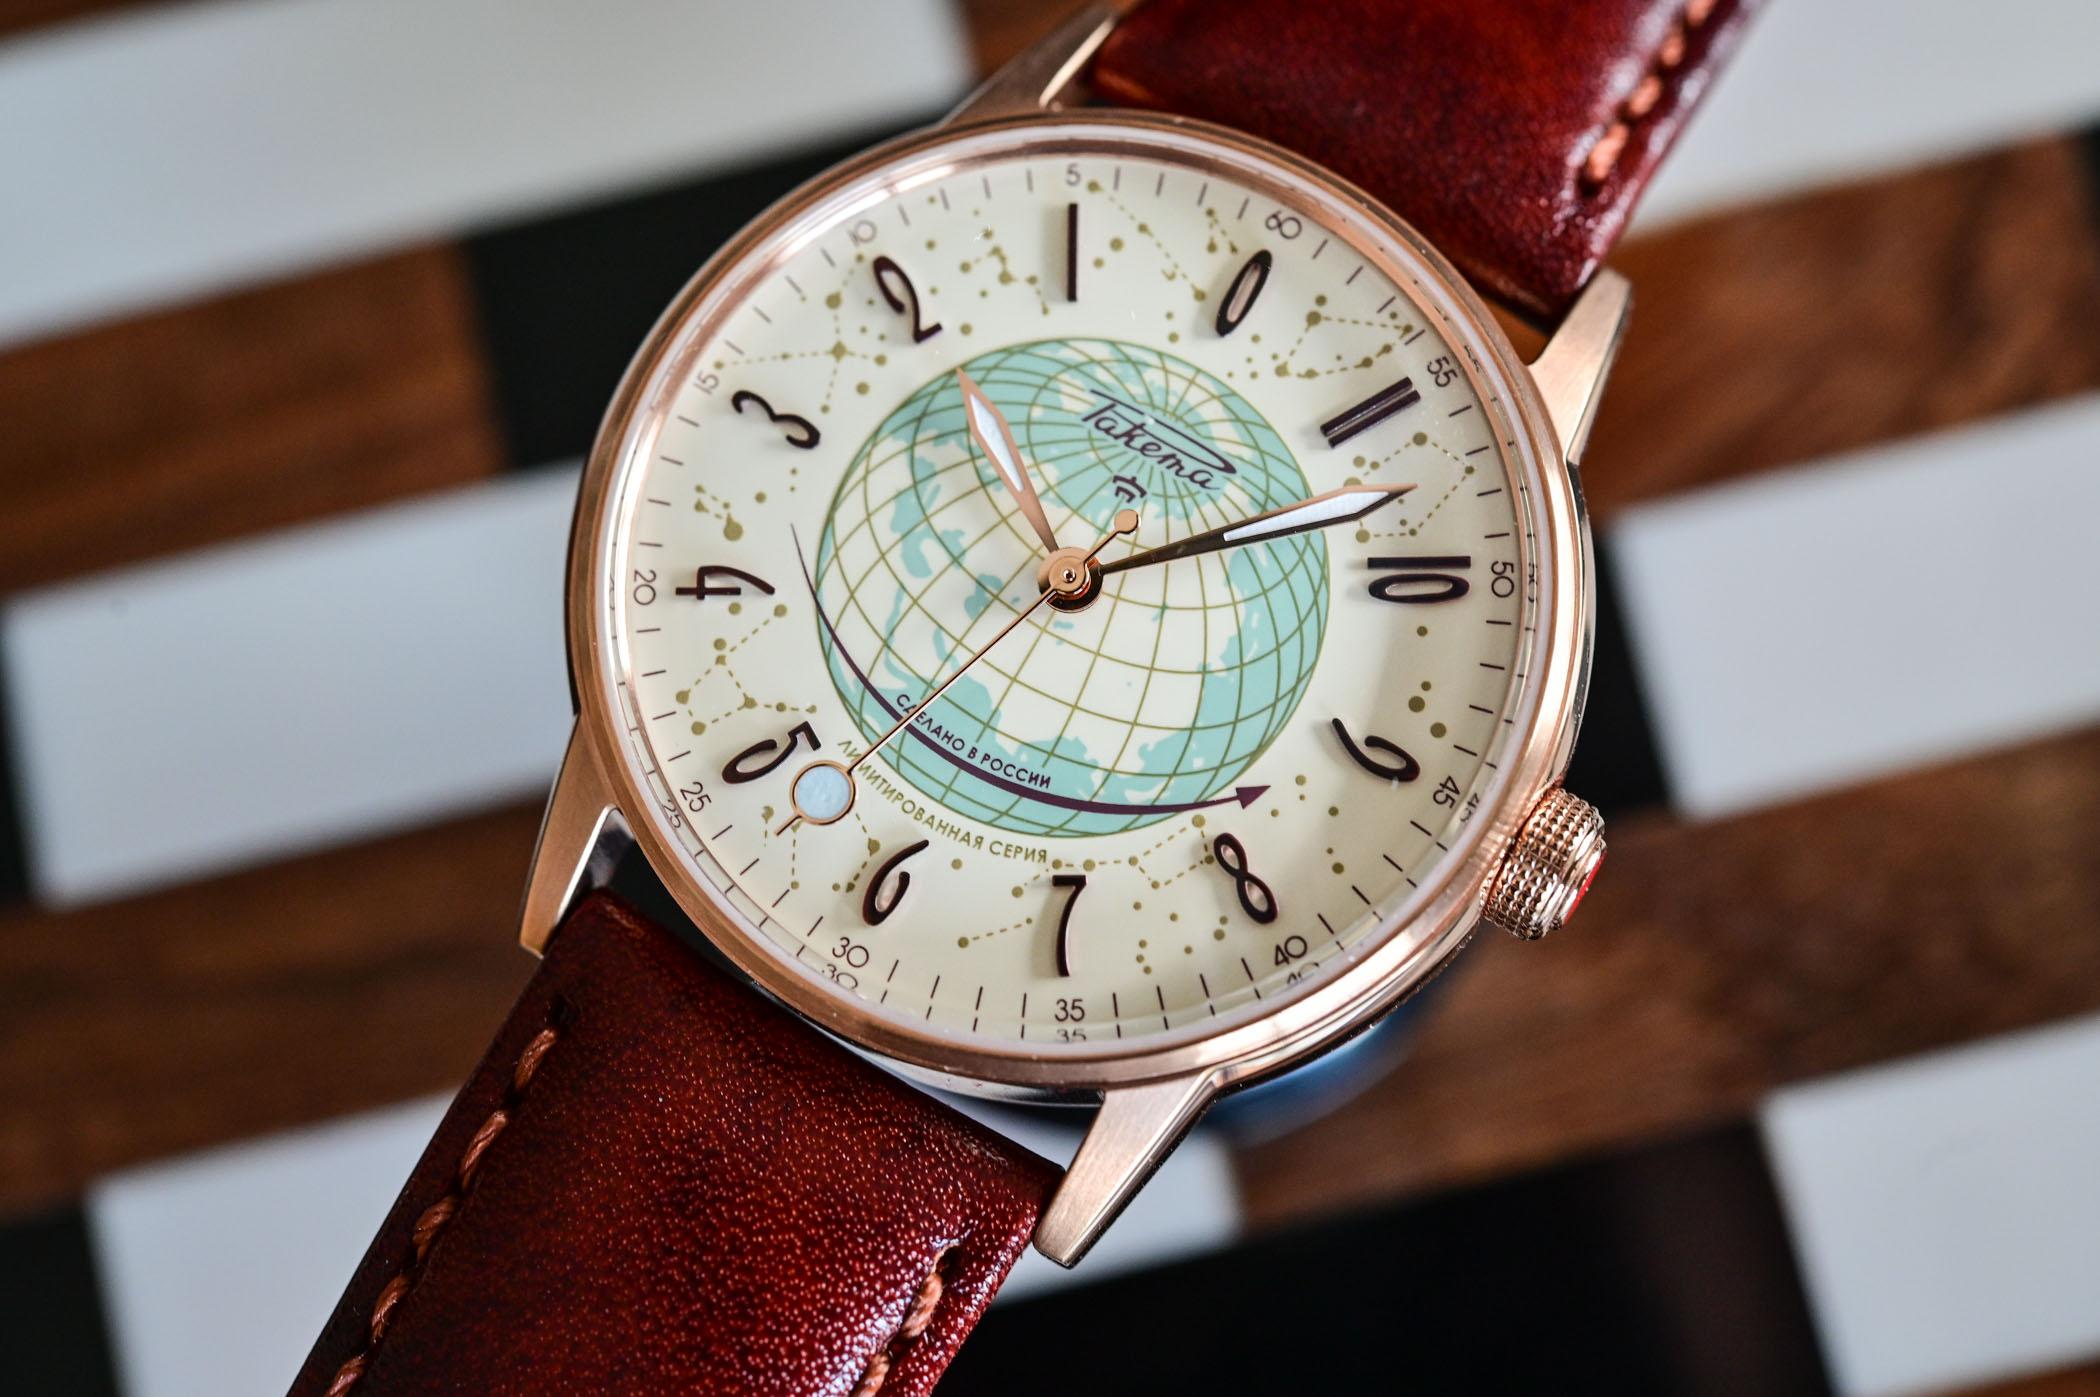 Raketa Russian Code counterclockwise watch